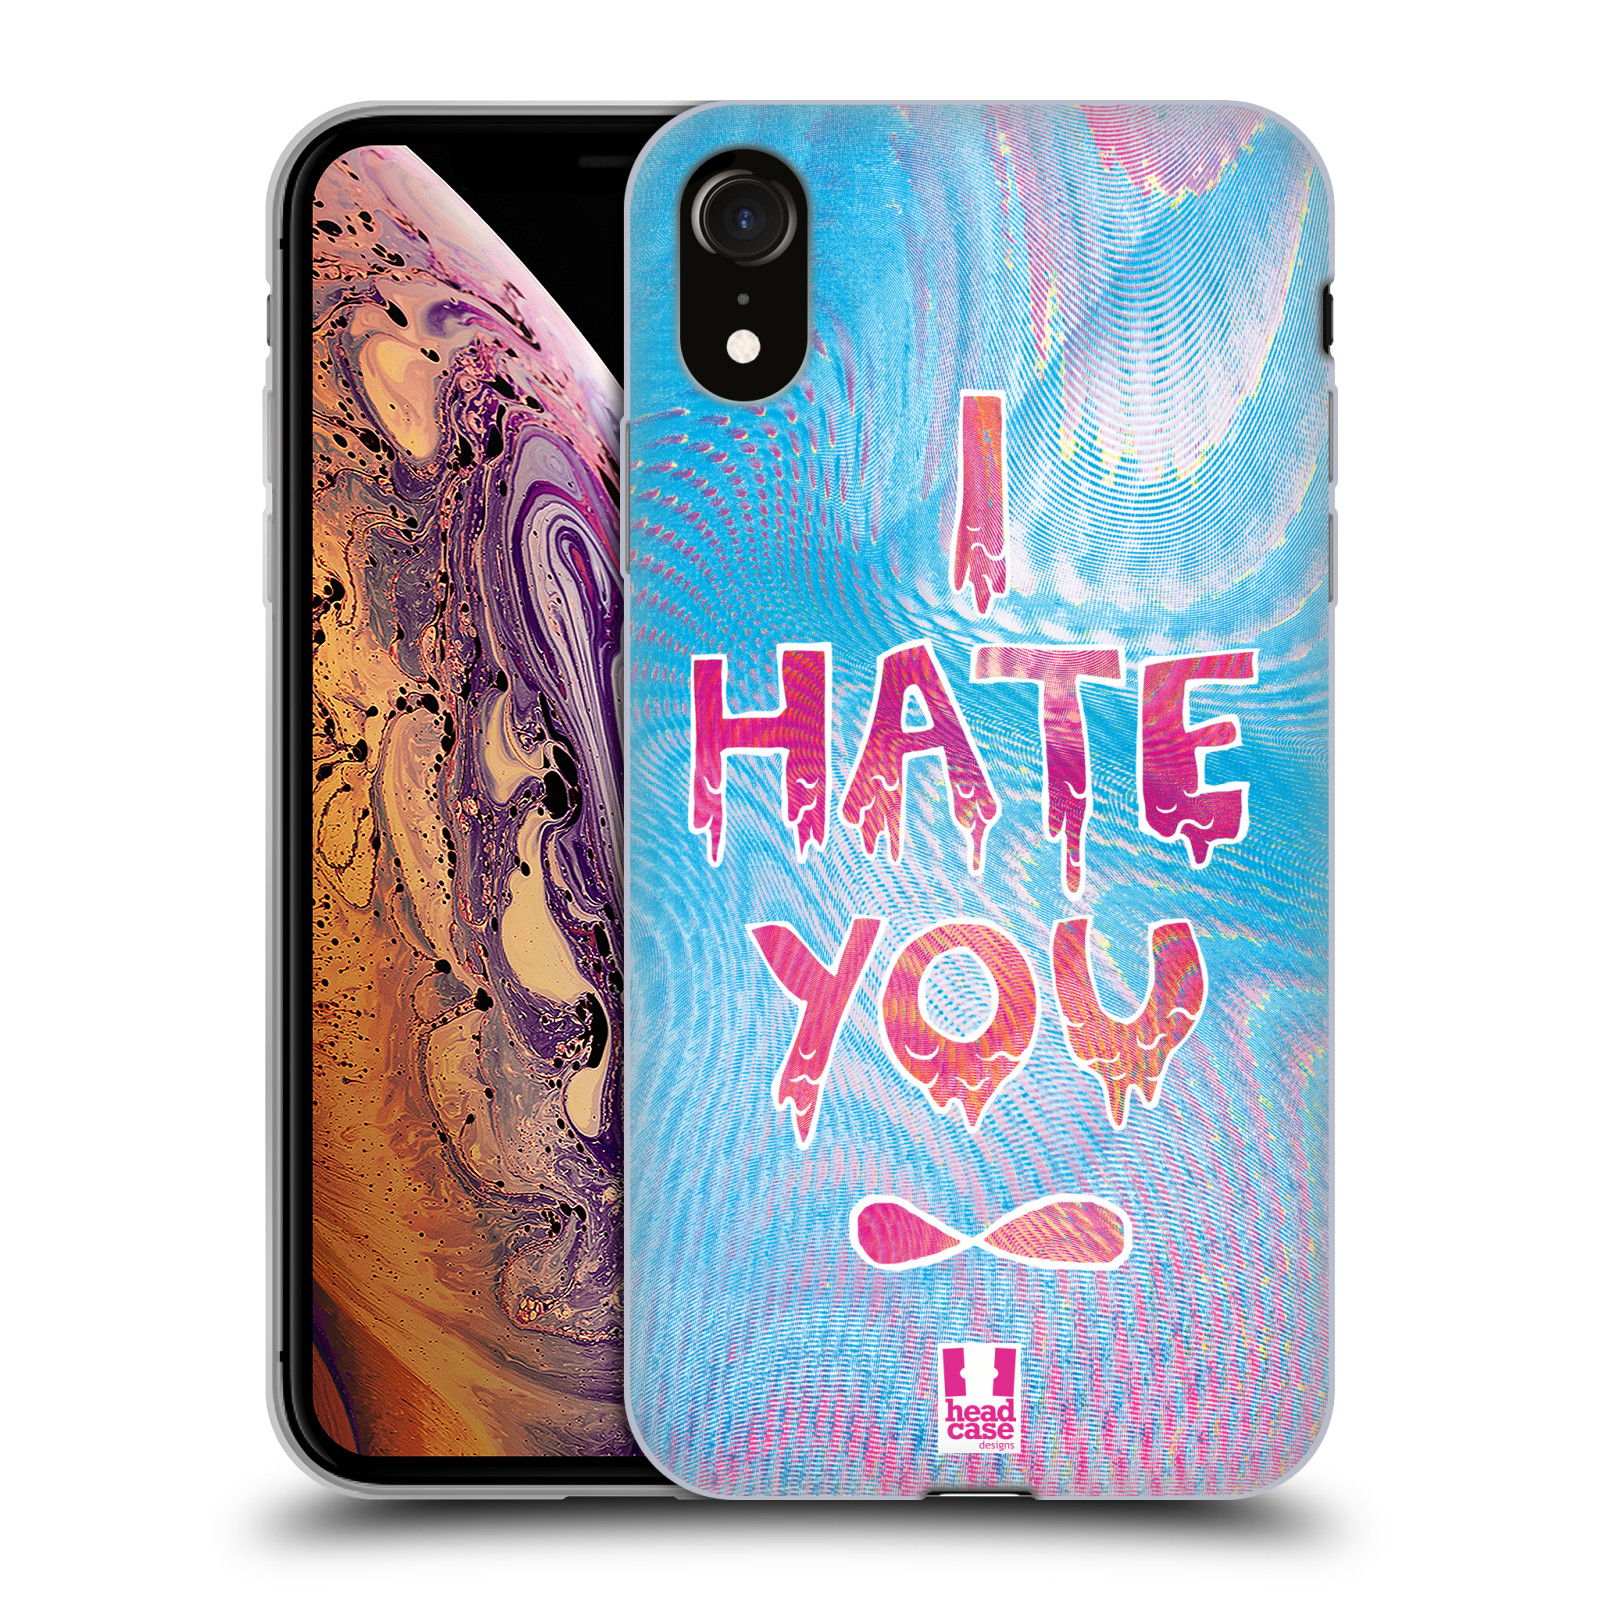 Silikonové pouzdro na mobil Apple iPhone XR - Head Case - HOLOGRAF HATE YOU